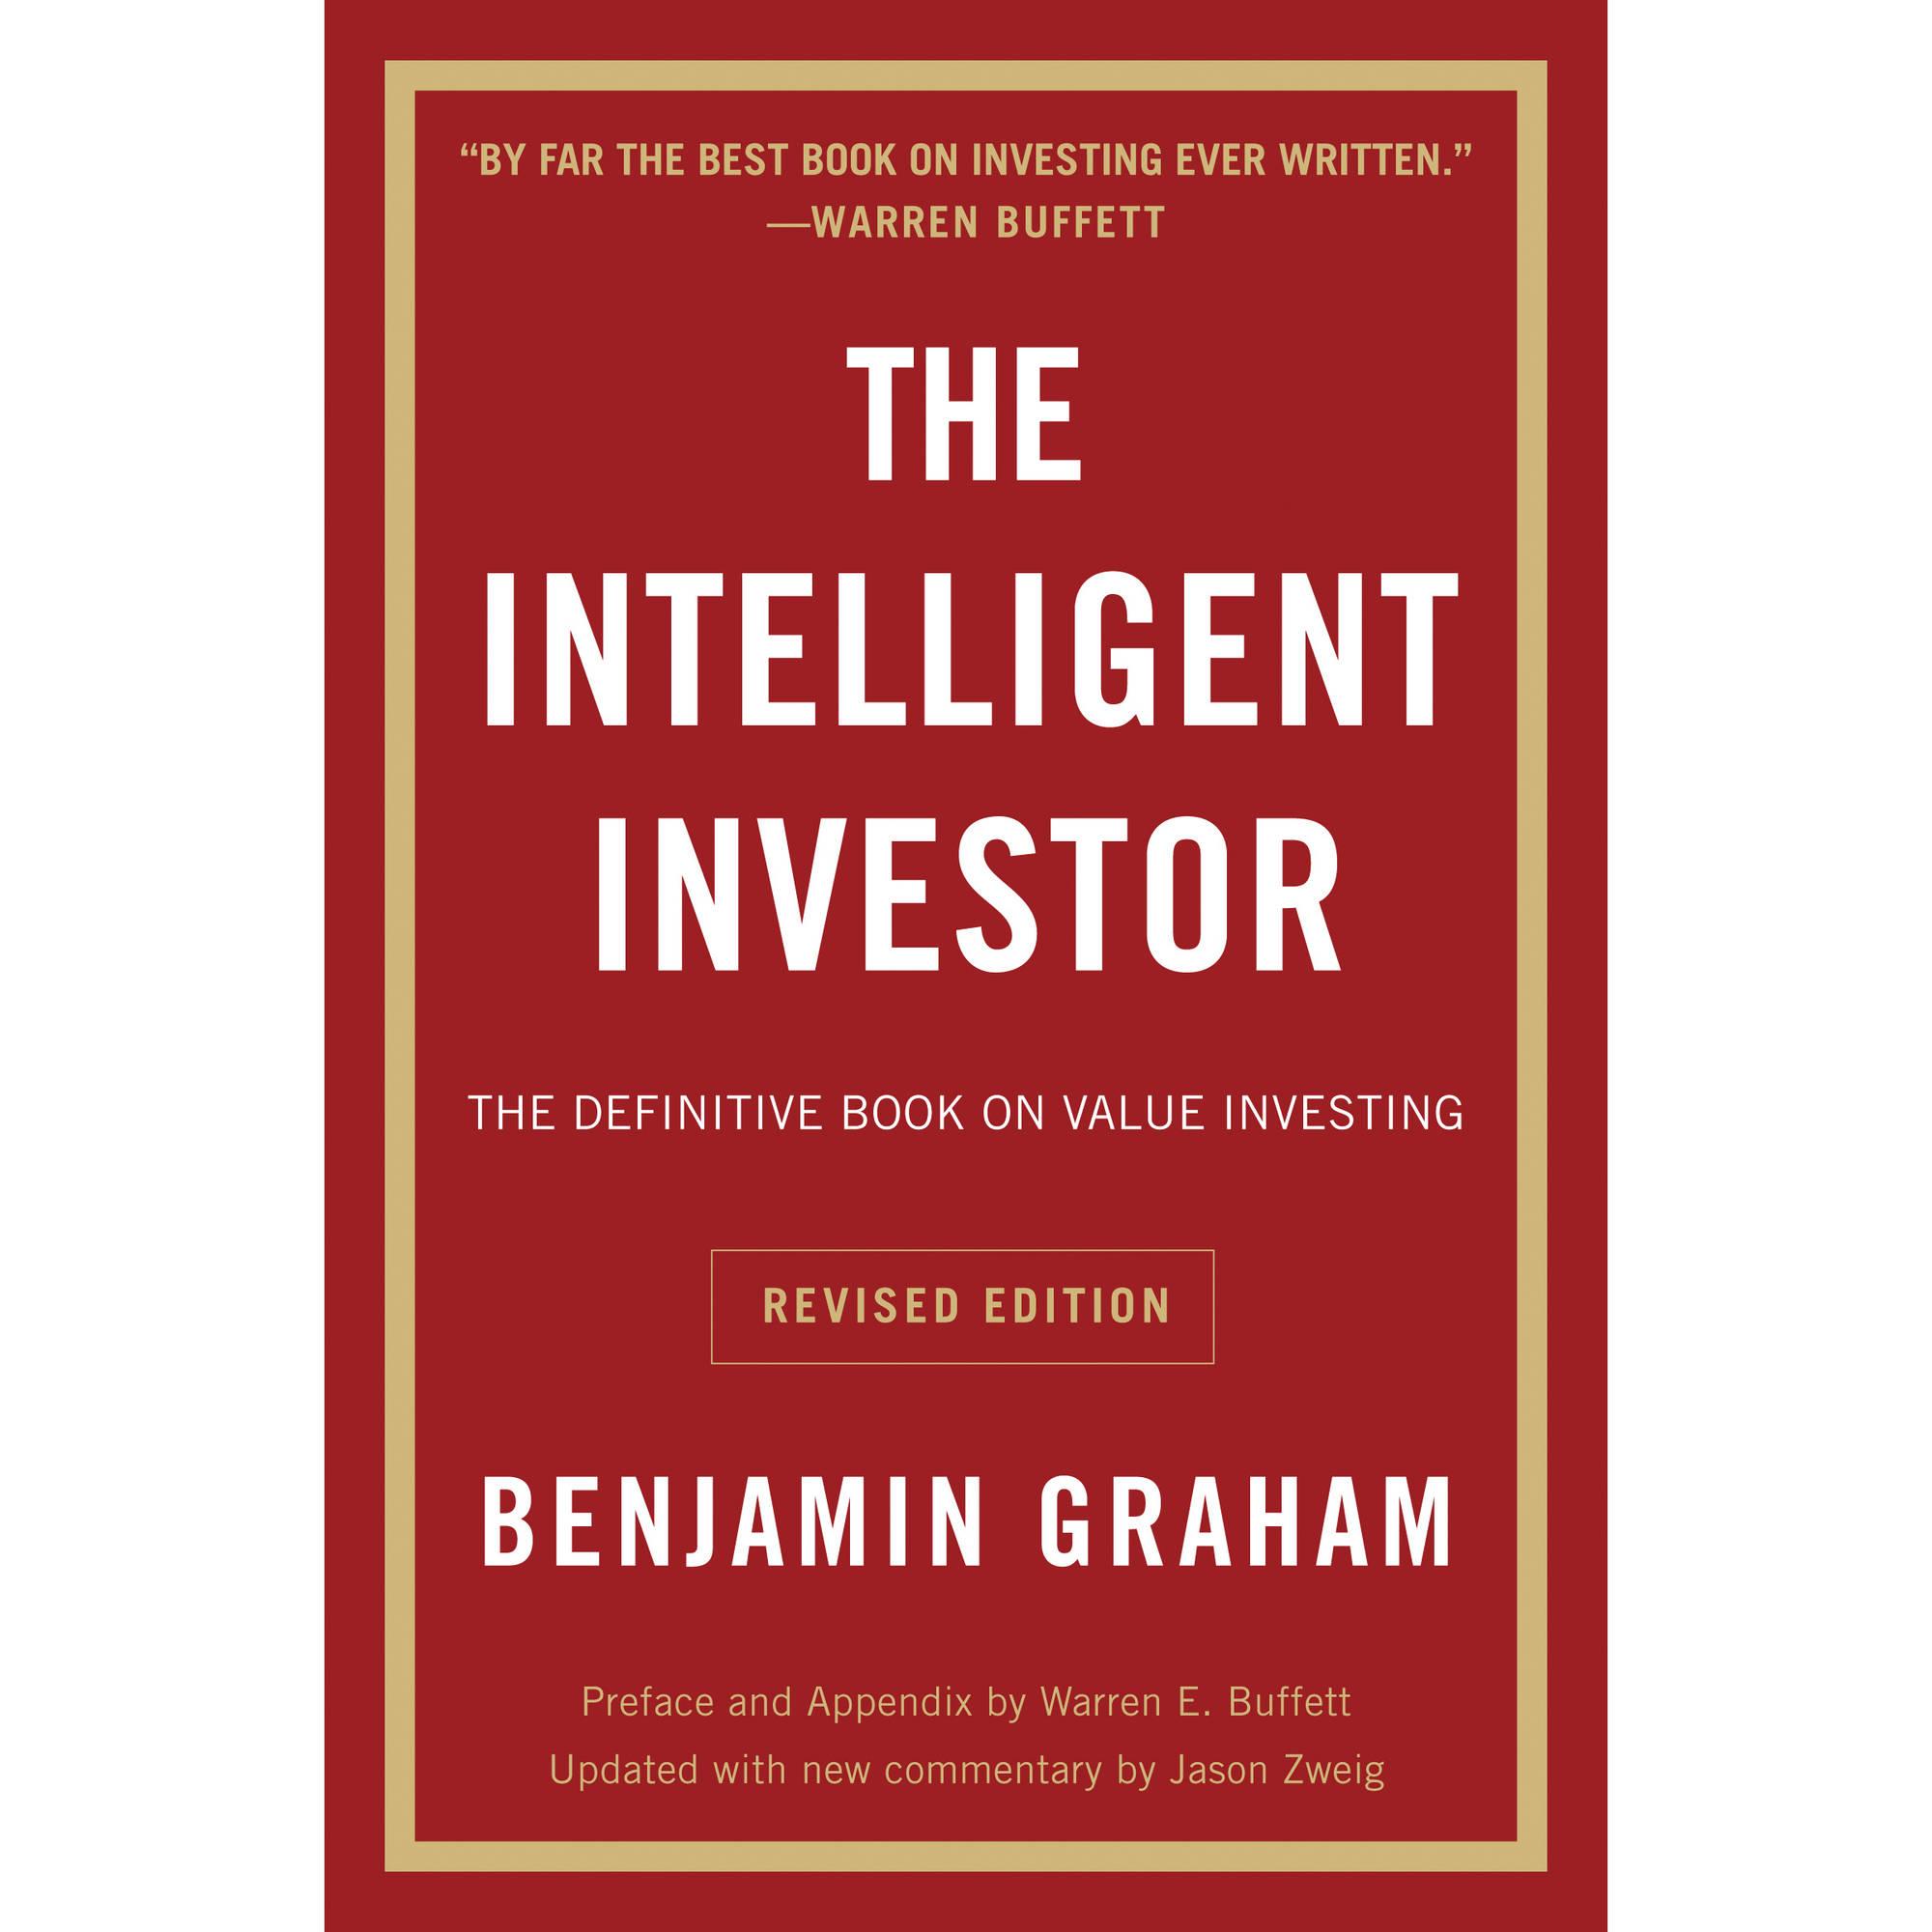 The Intelligent Investor.jpeg